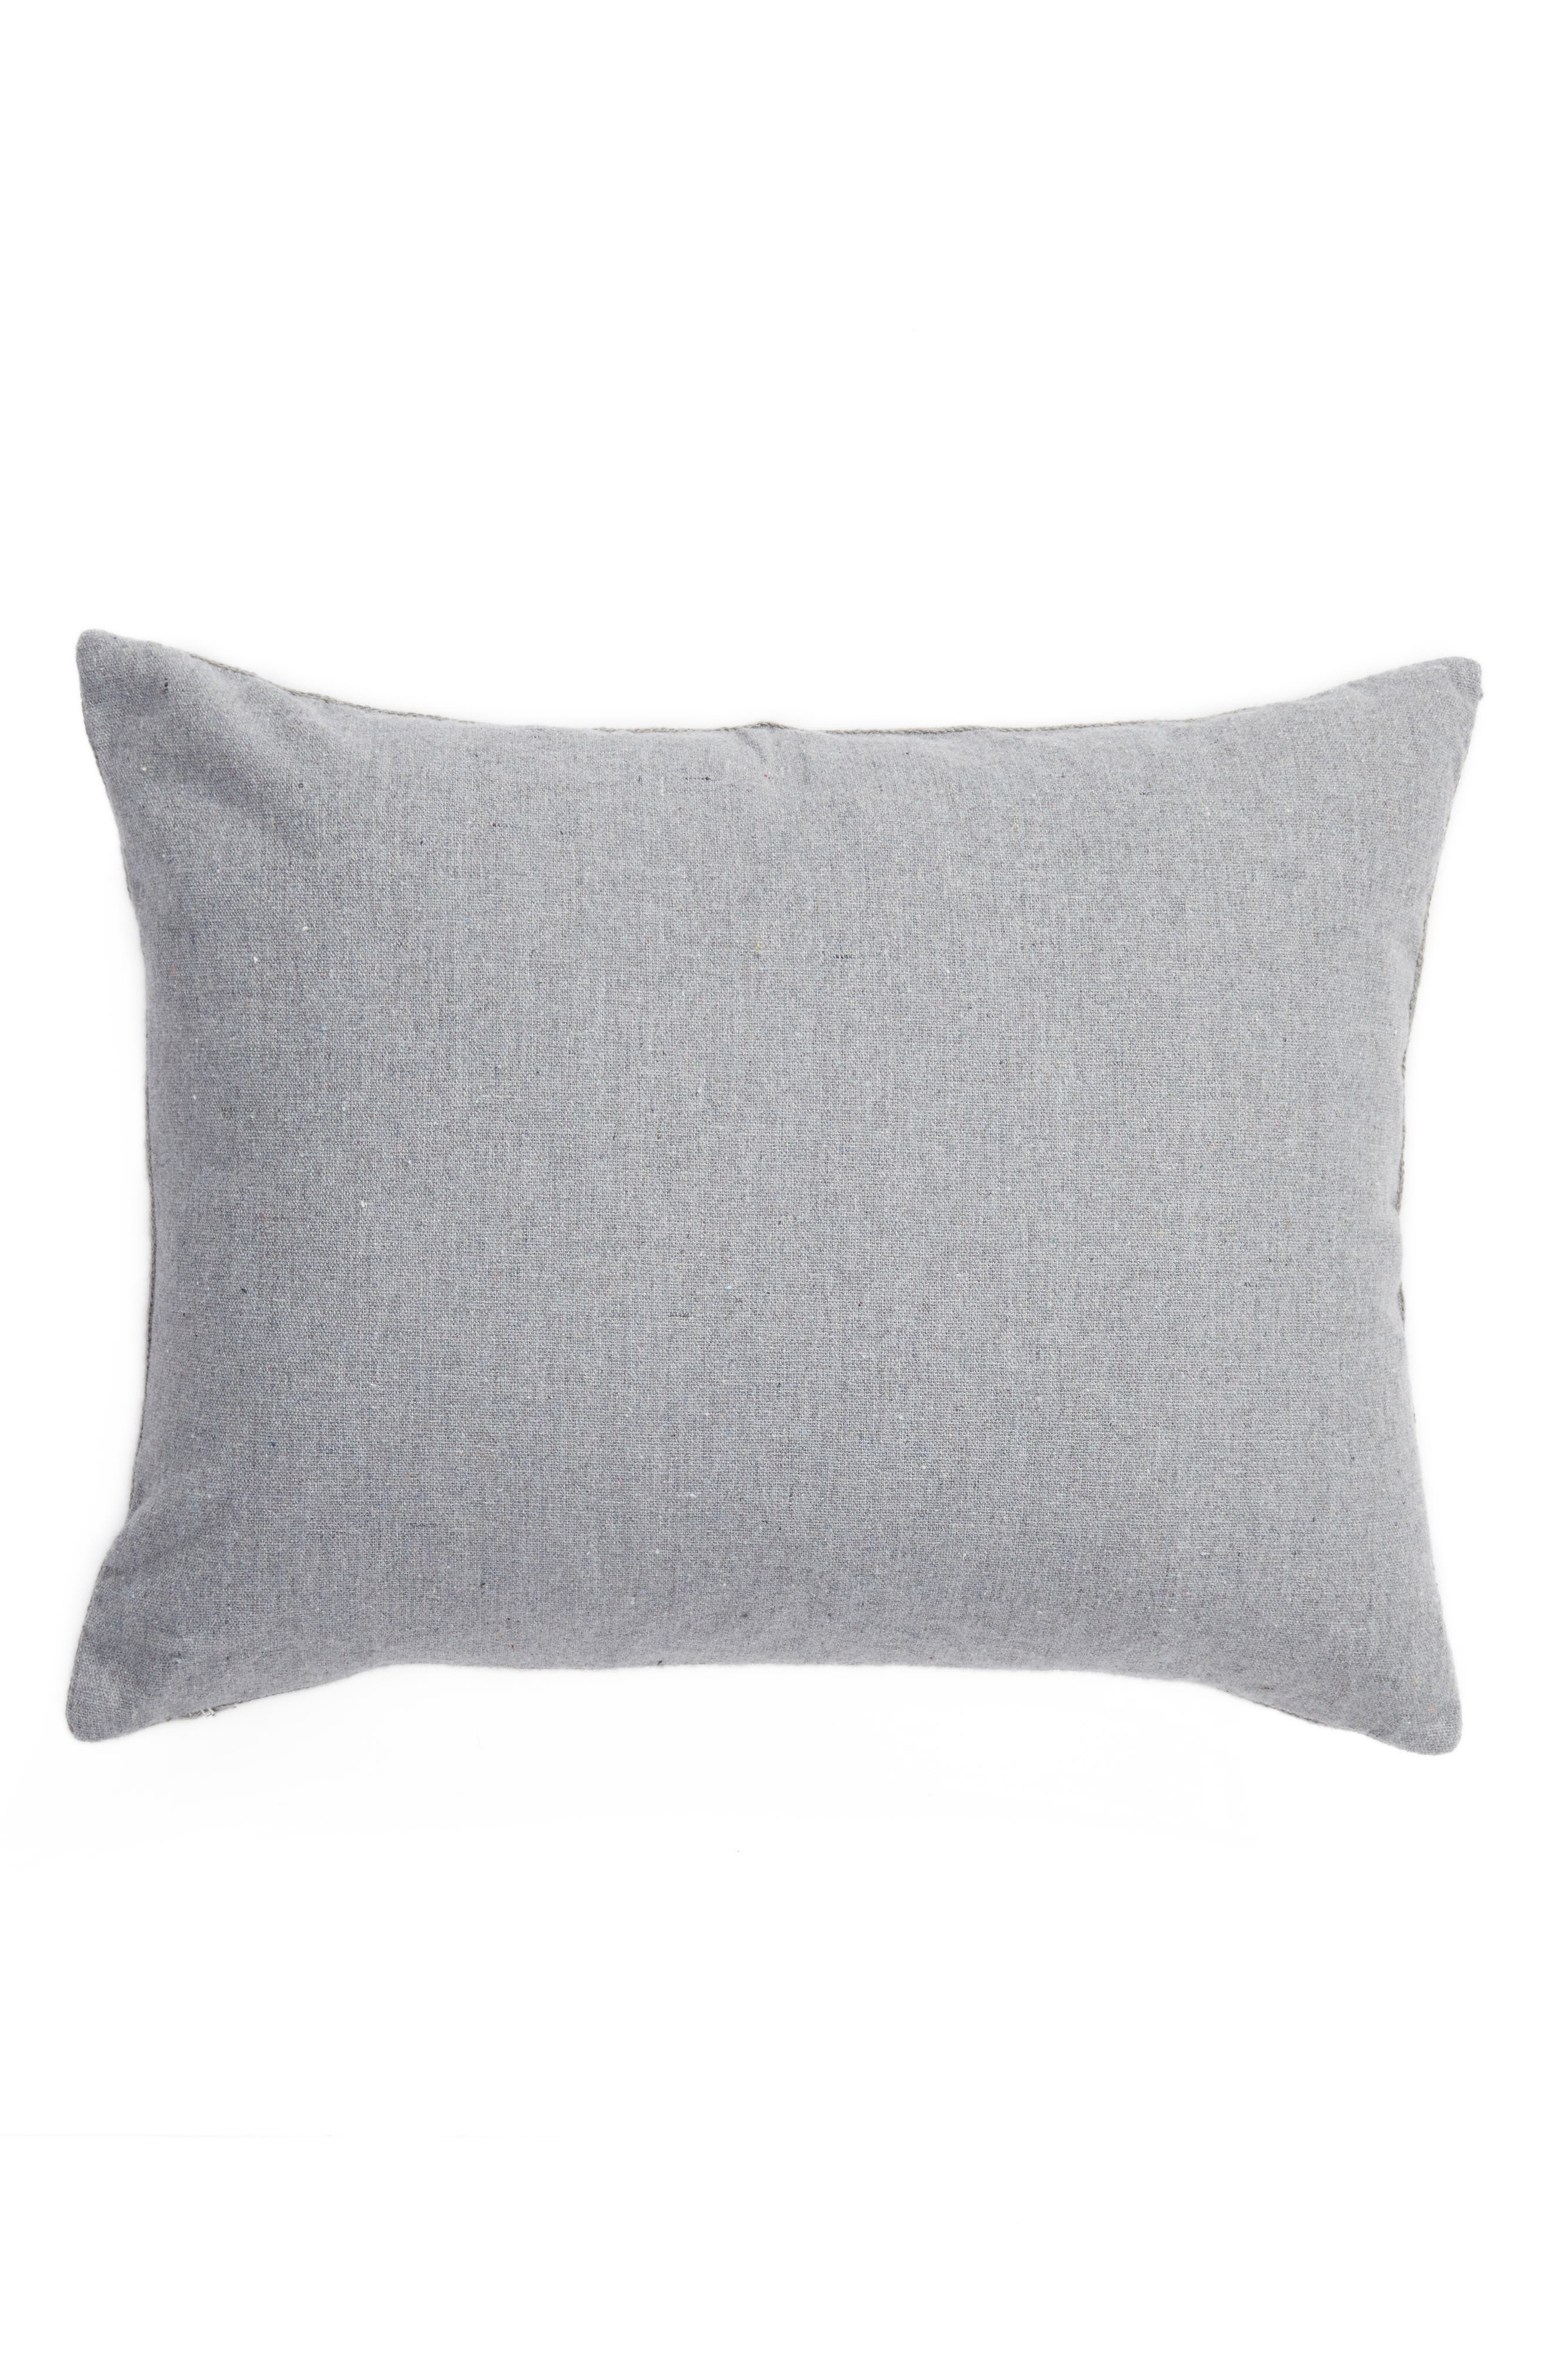 Alternate Image 3  - Levtex Caleb Crewel Stitch Accent Pillow